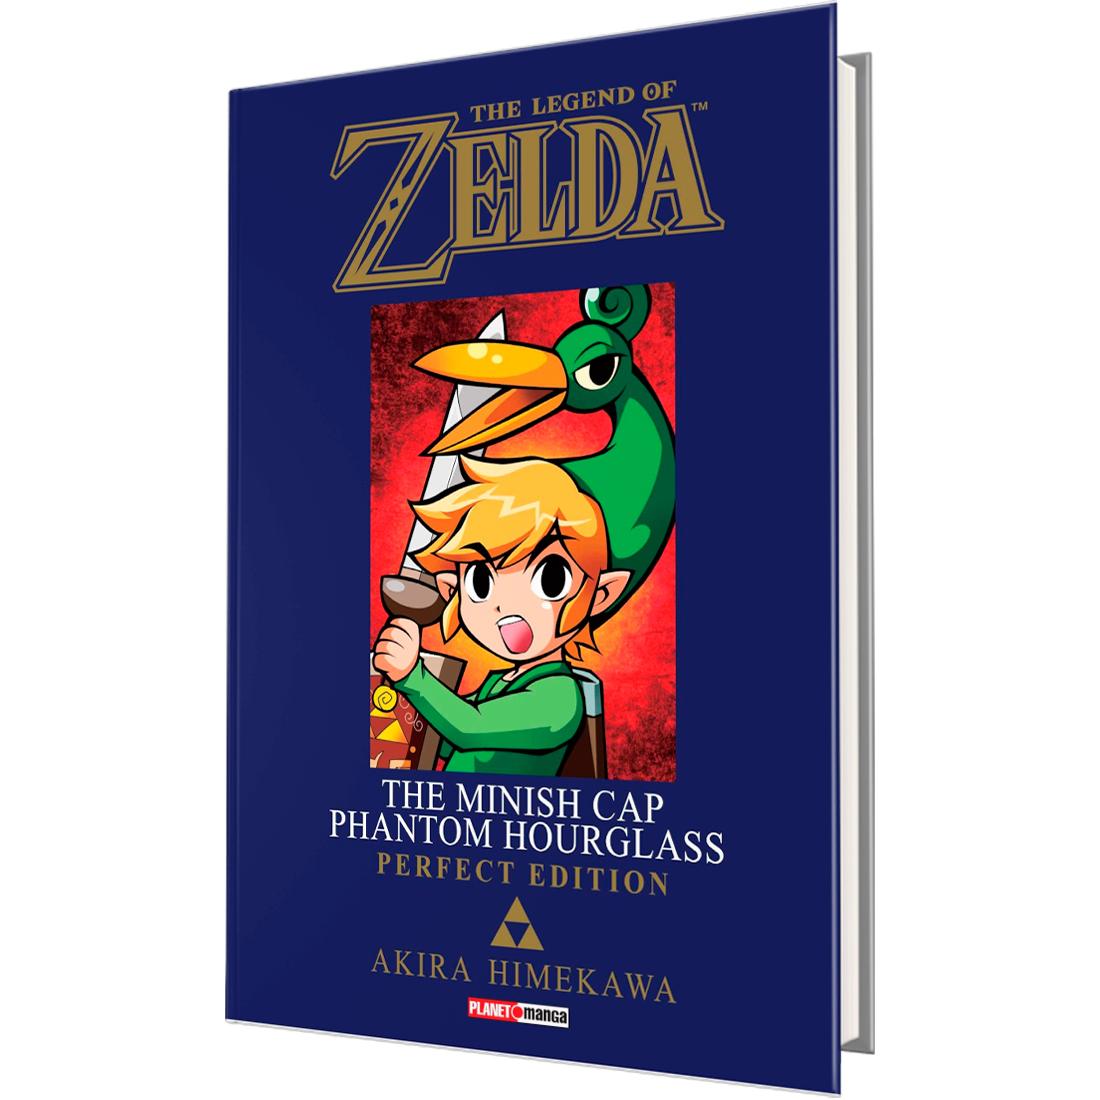 The Legend of Zelda - The Minish Cap Phantom Hourglass